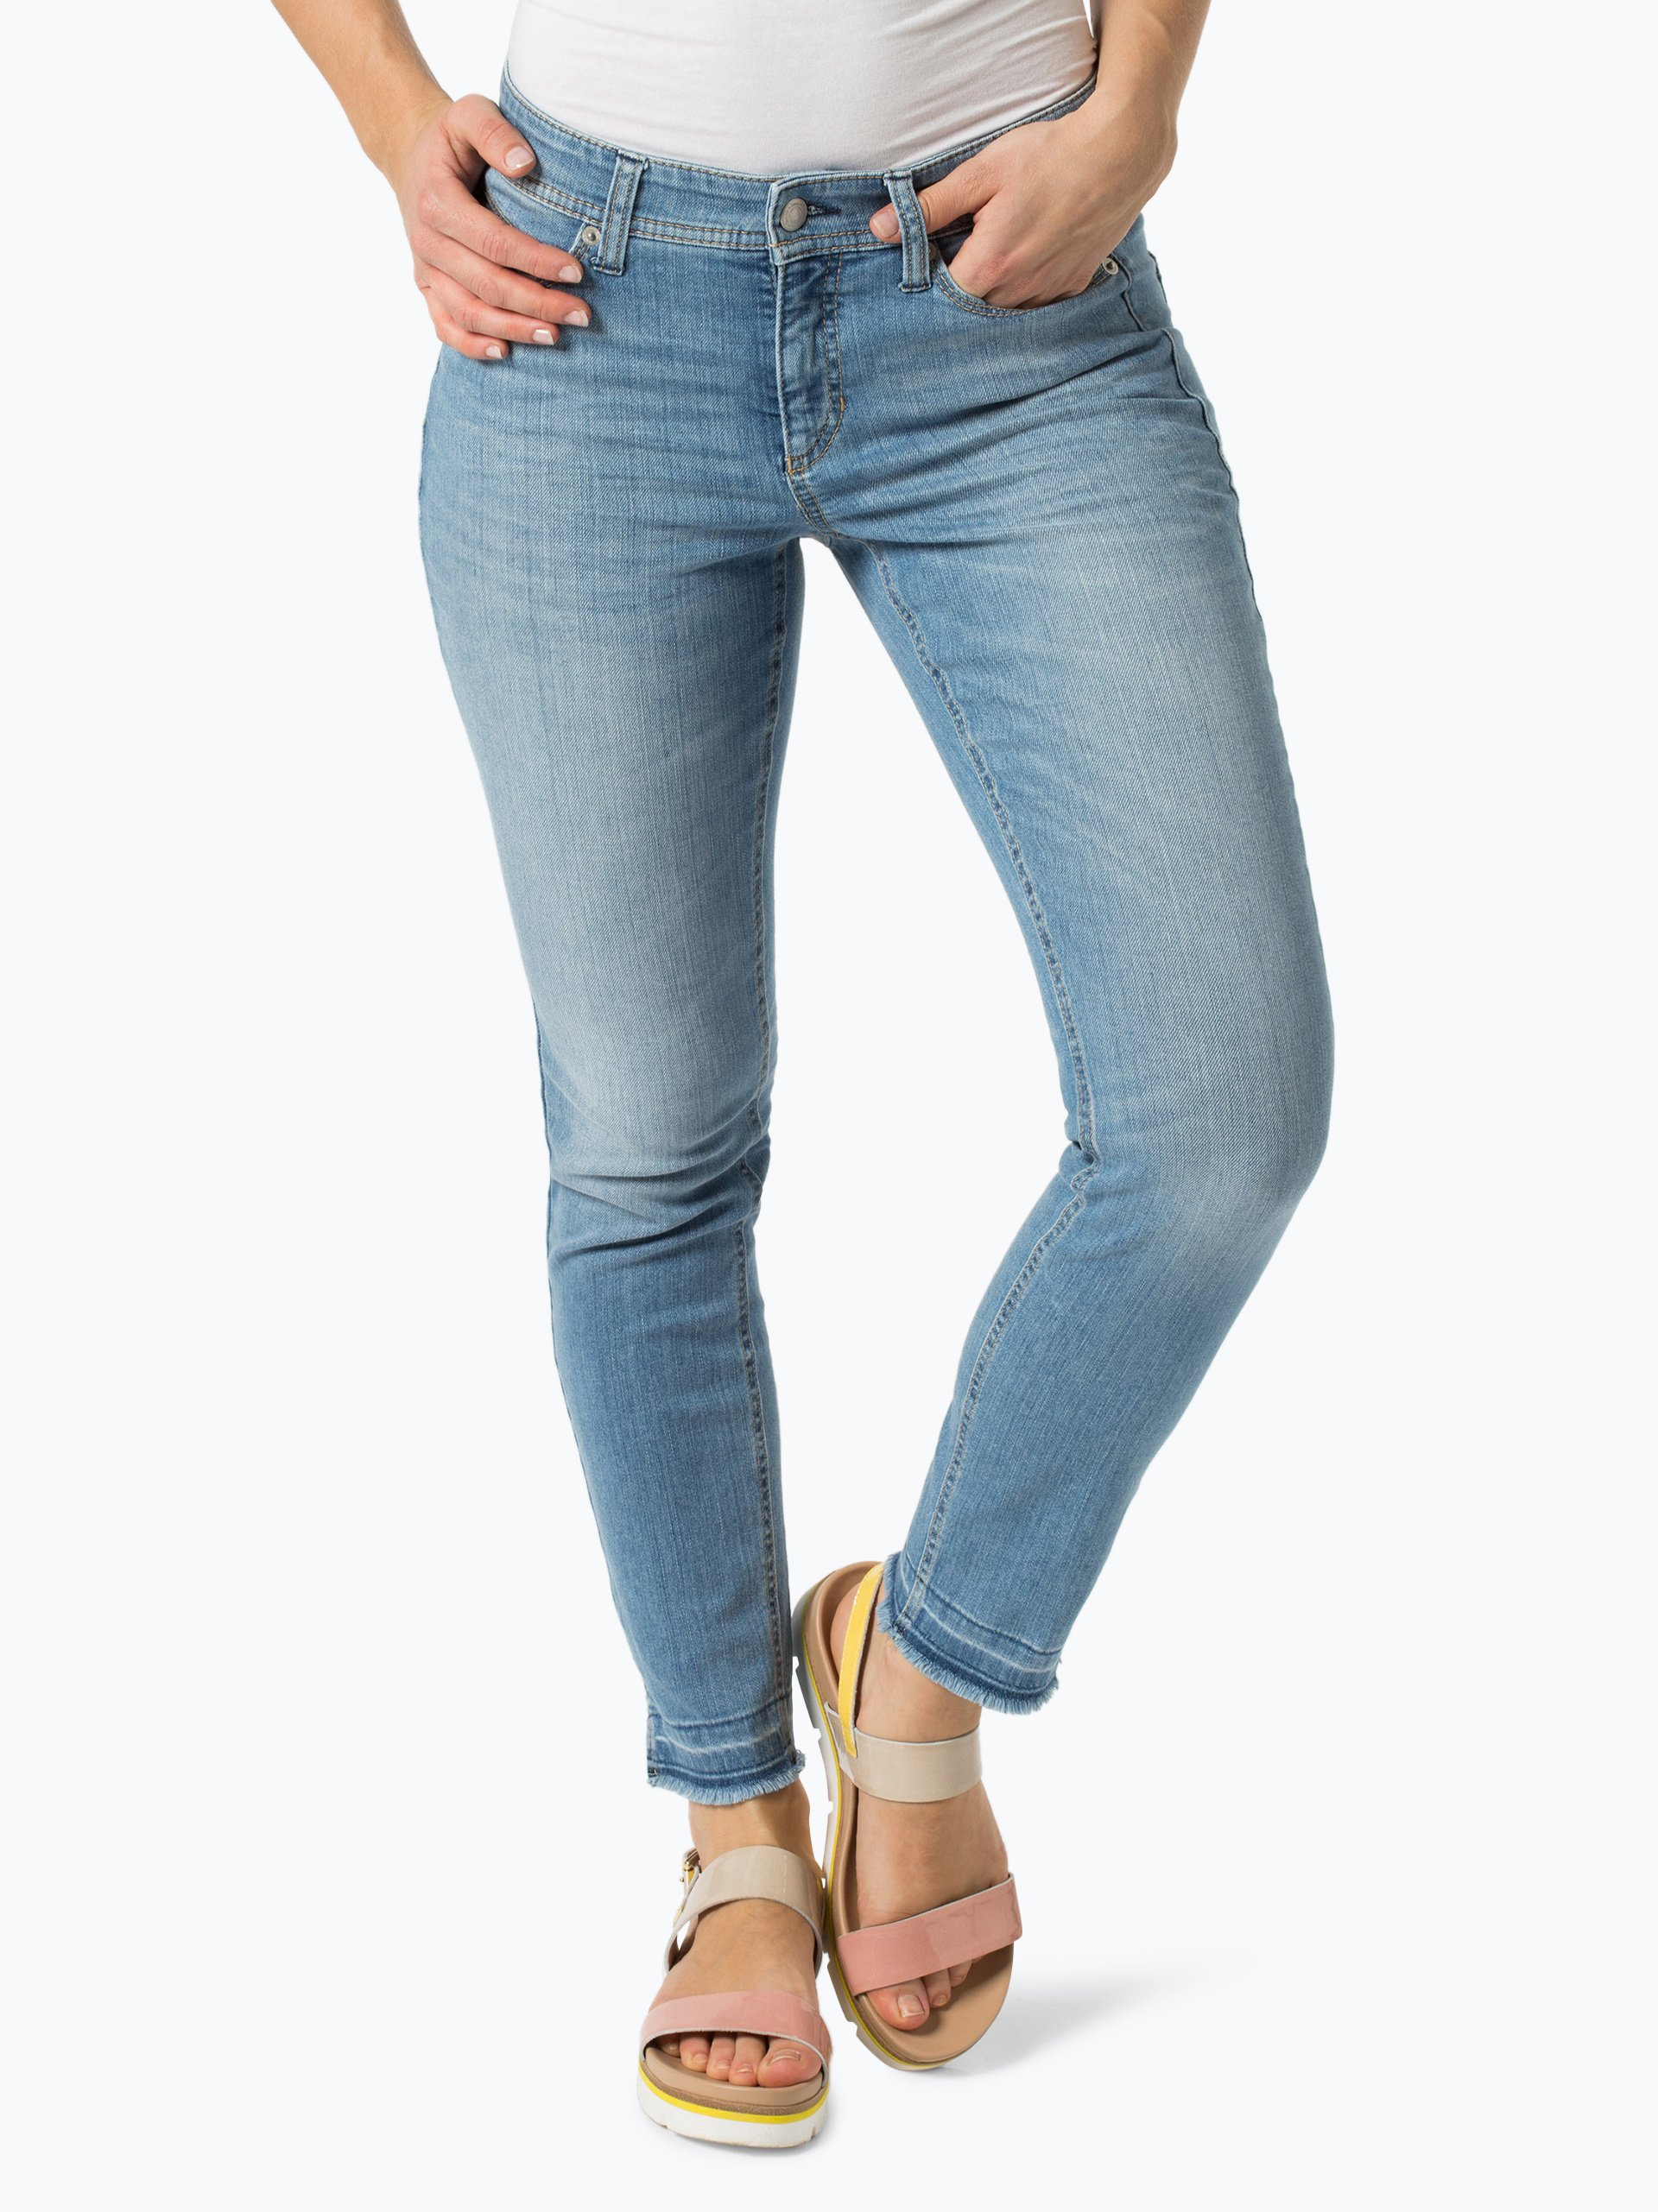 cambio damen jeans parla light stone uni online kaufen vangraaf com. Black Bedroom Furniture Sets. Home Design Ideas